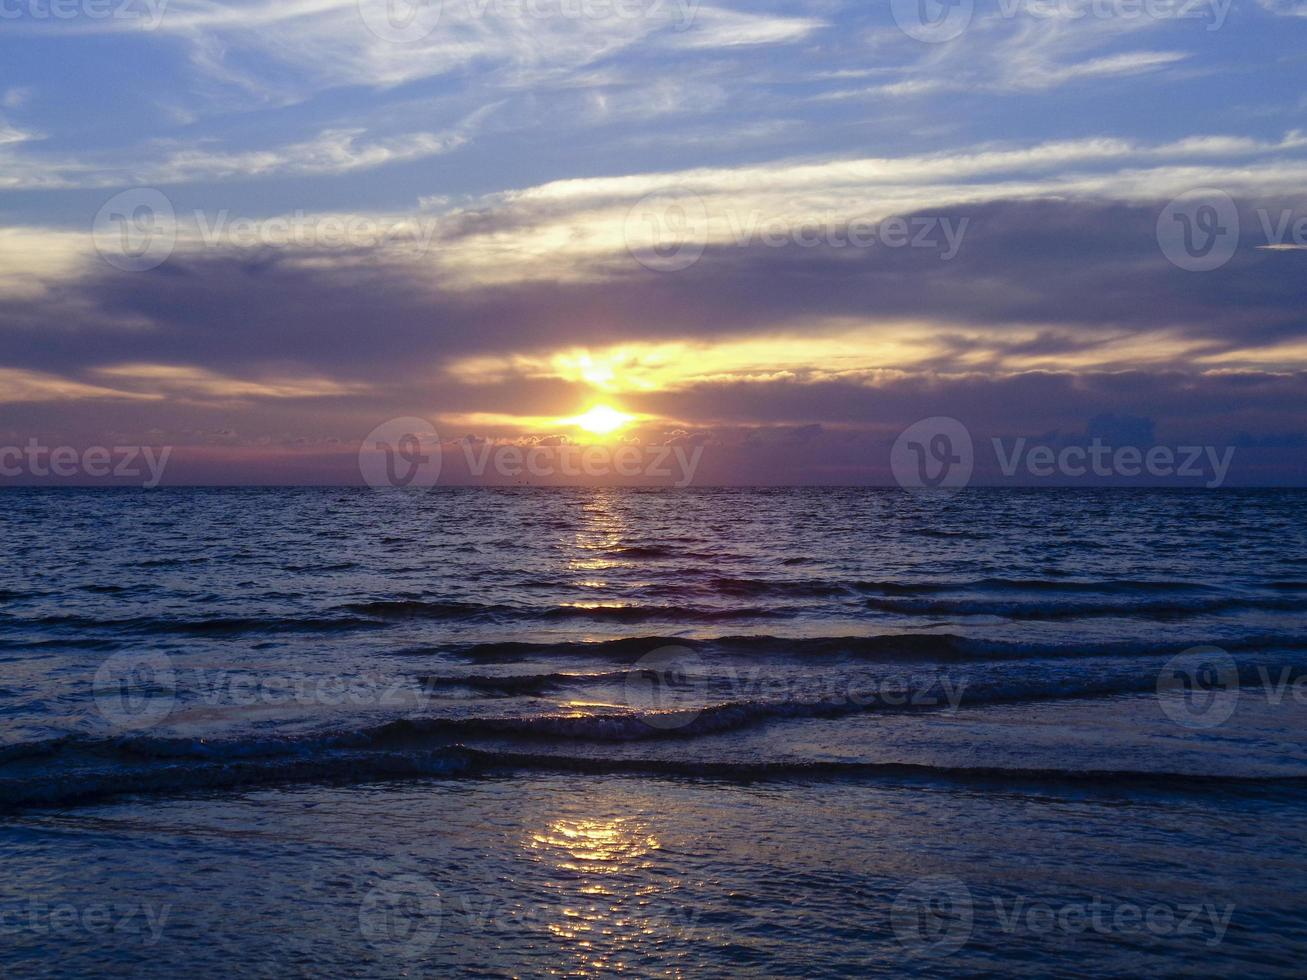 Sonnenuntergang Ozean foto